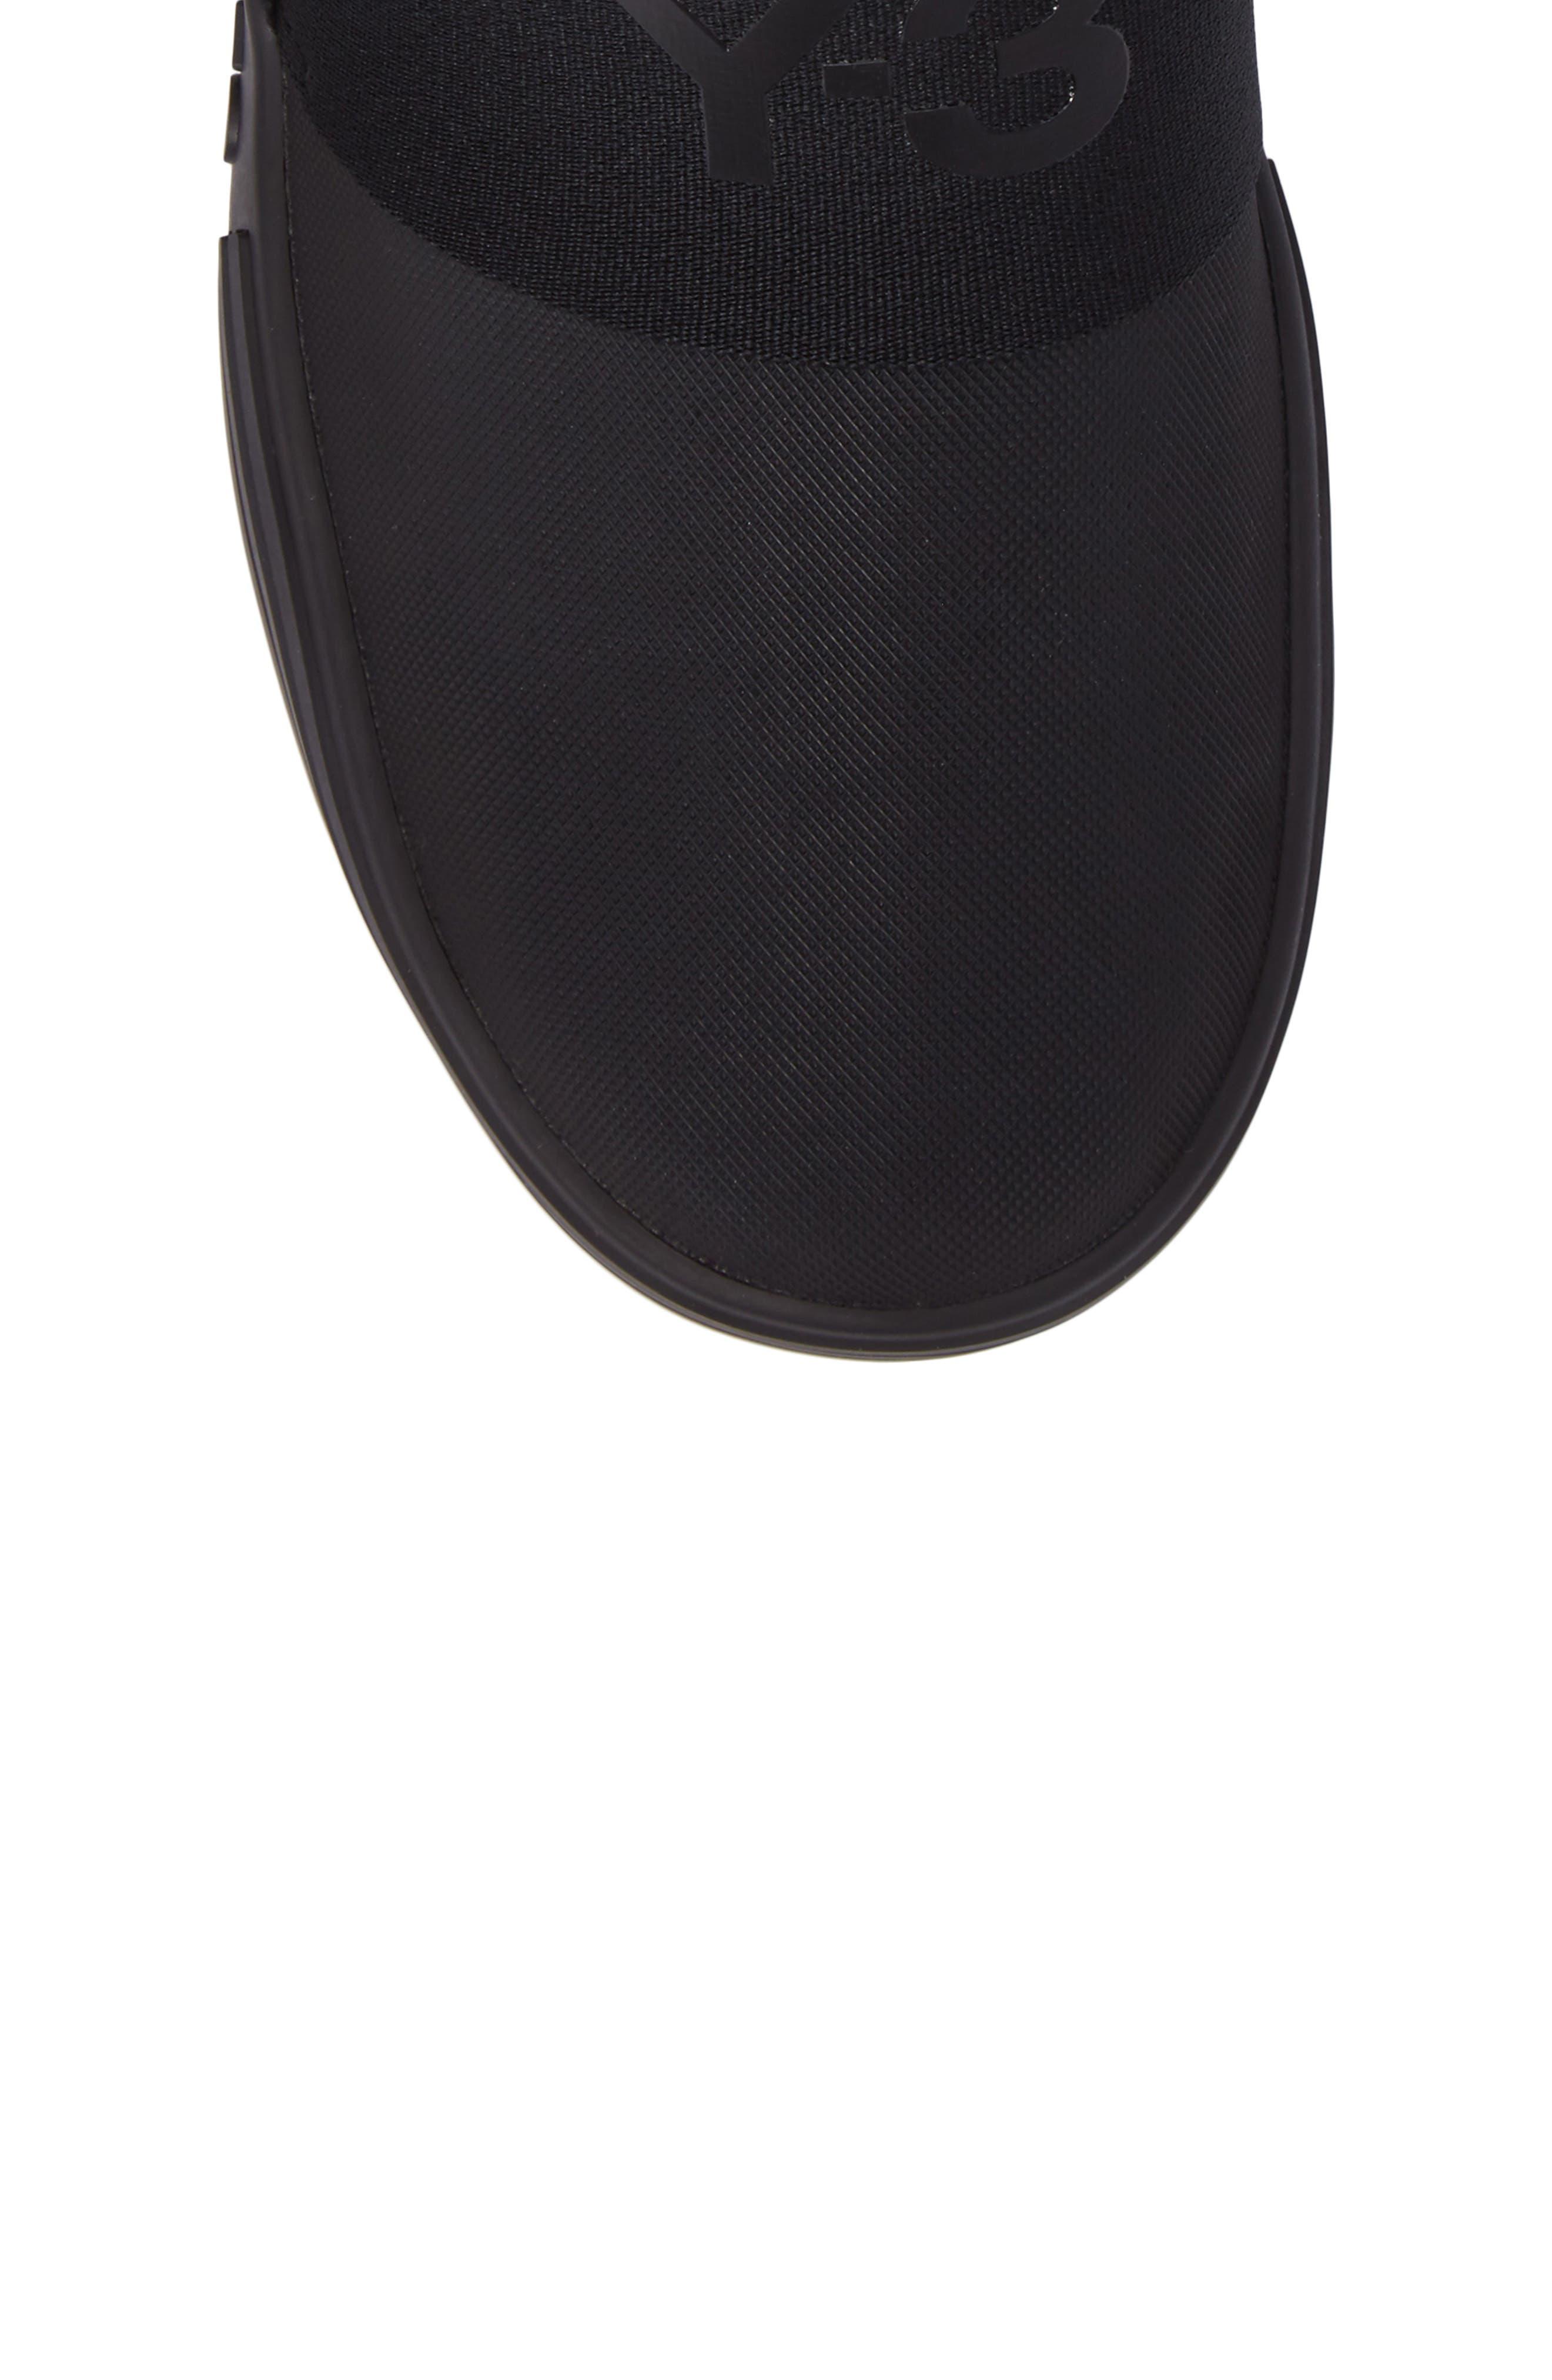 Sno Foxing High Top Sneaker,                             Alternate thumbnail 5, color,                             Core Black / White